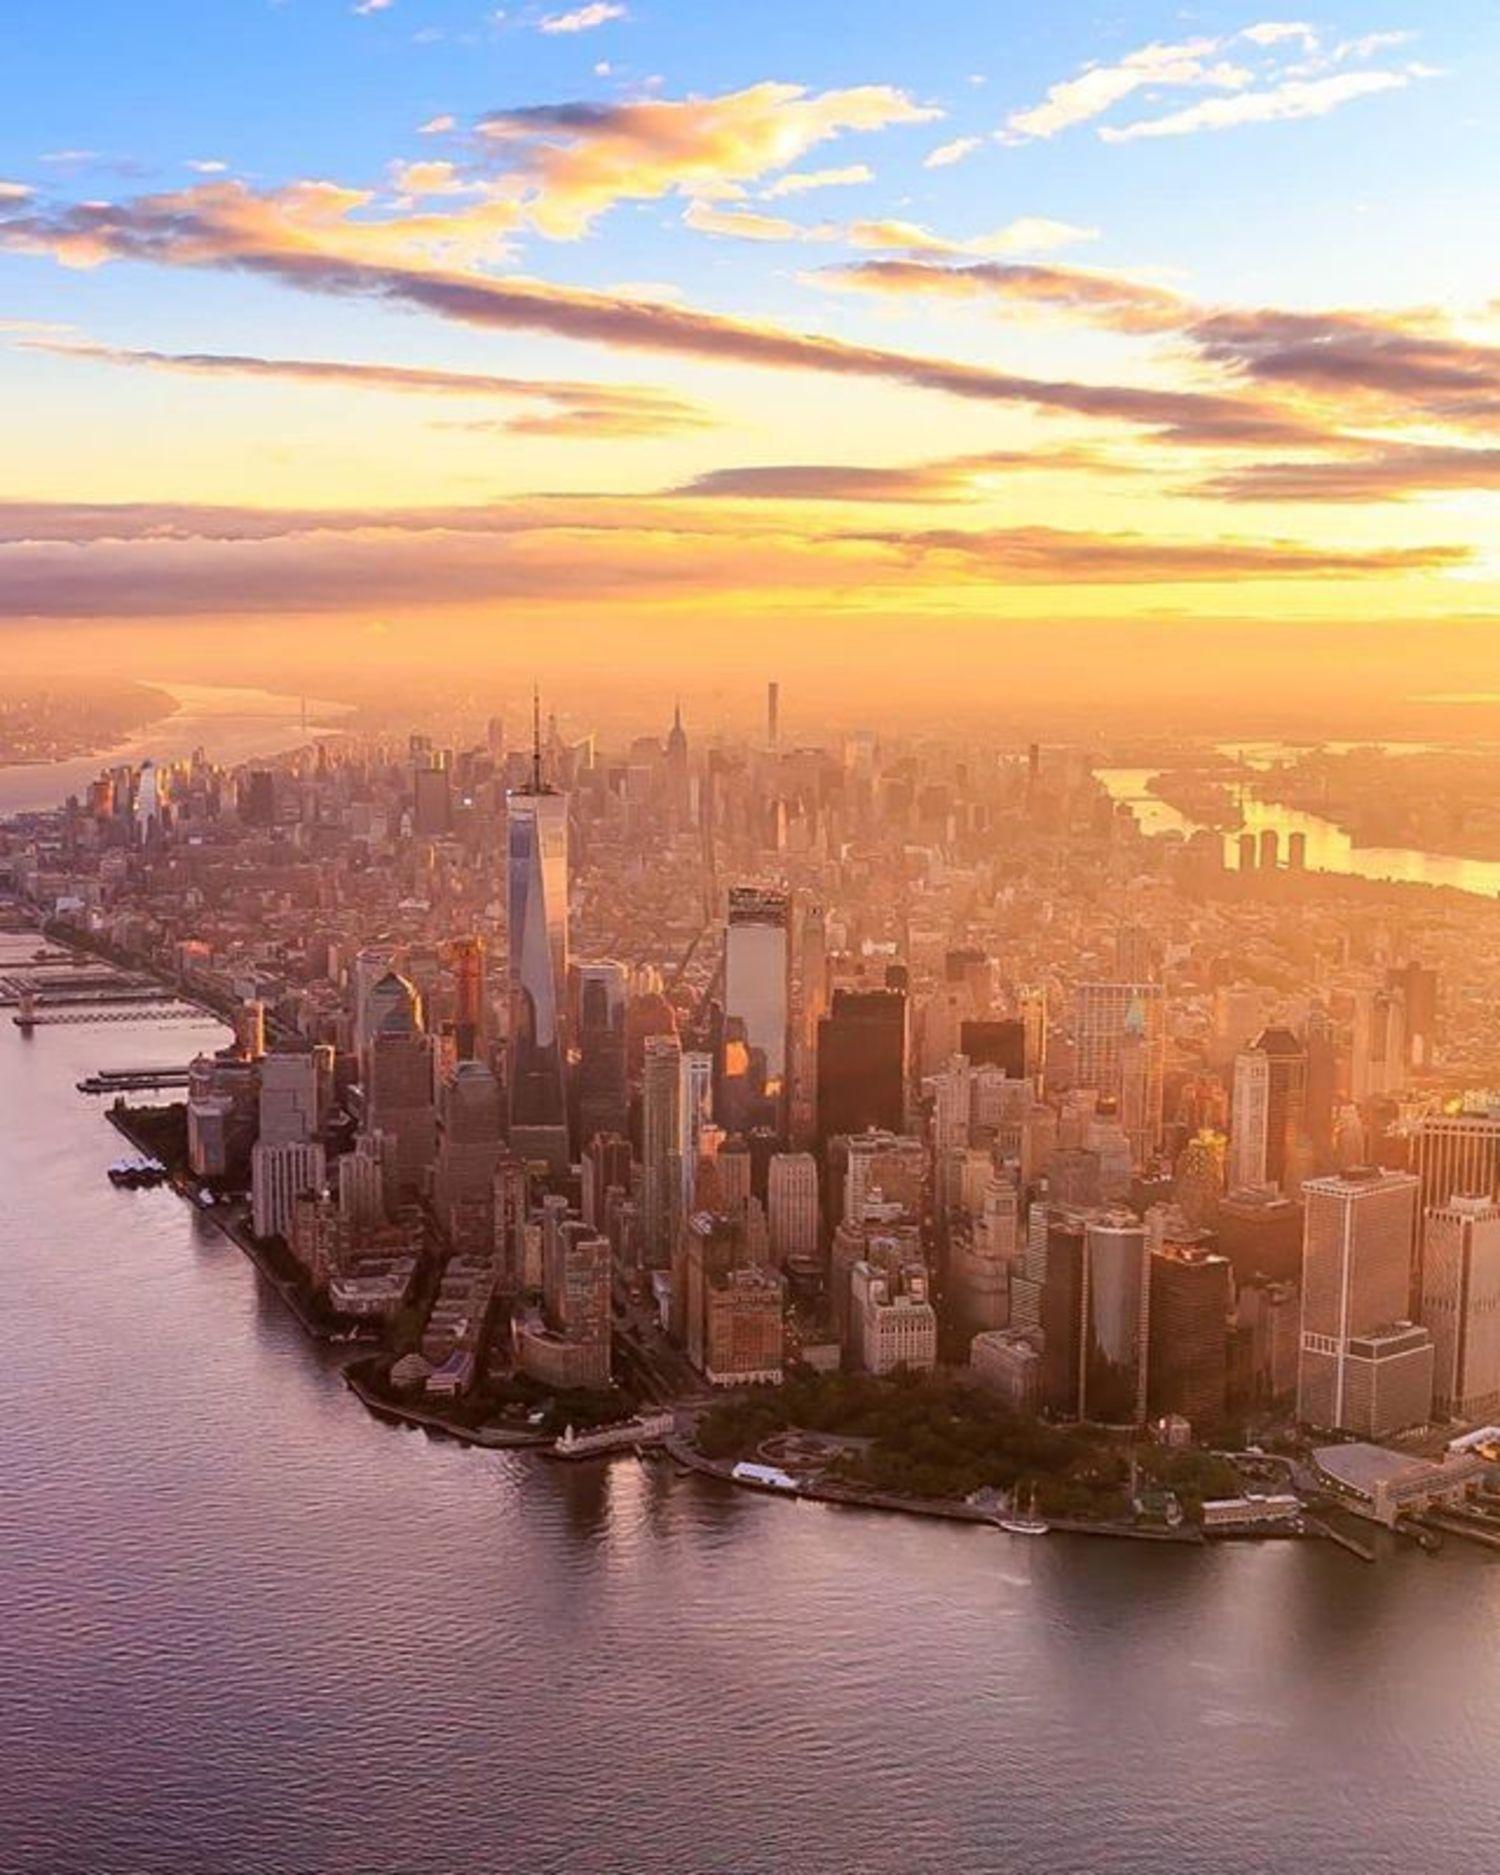 New York, New York. Photo via @killahwave #viewingnyc #newyorkcity #newyork #nyc #sunrise